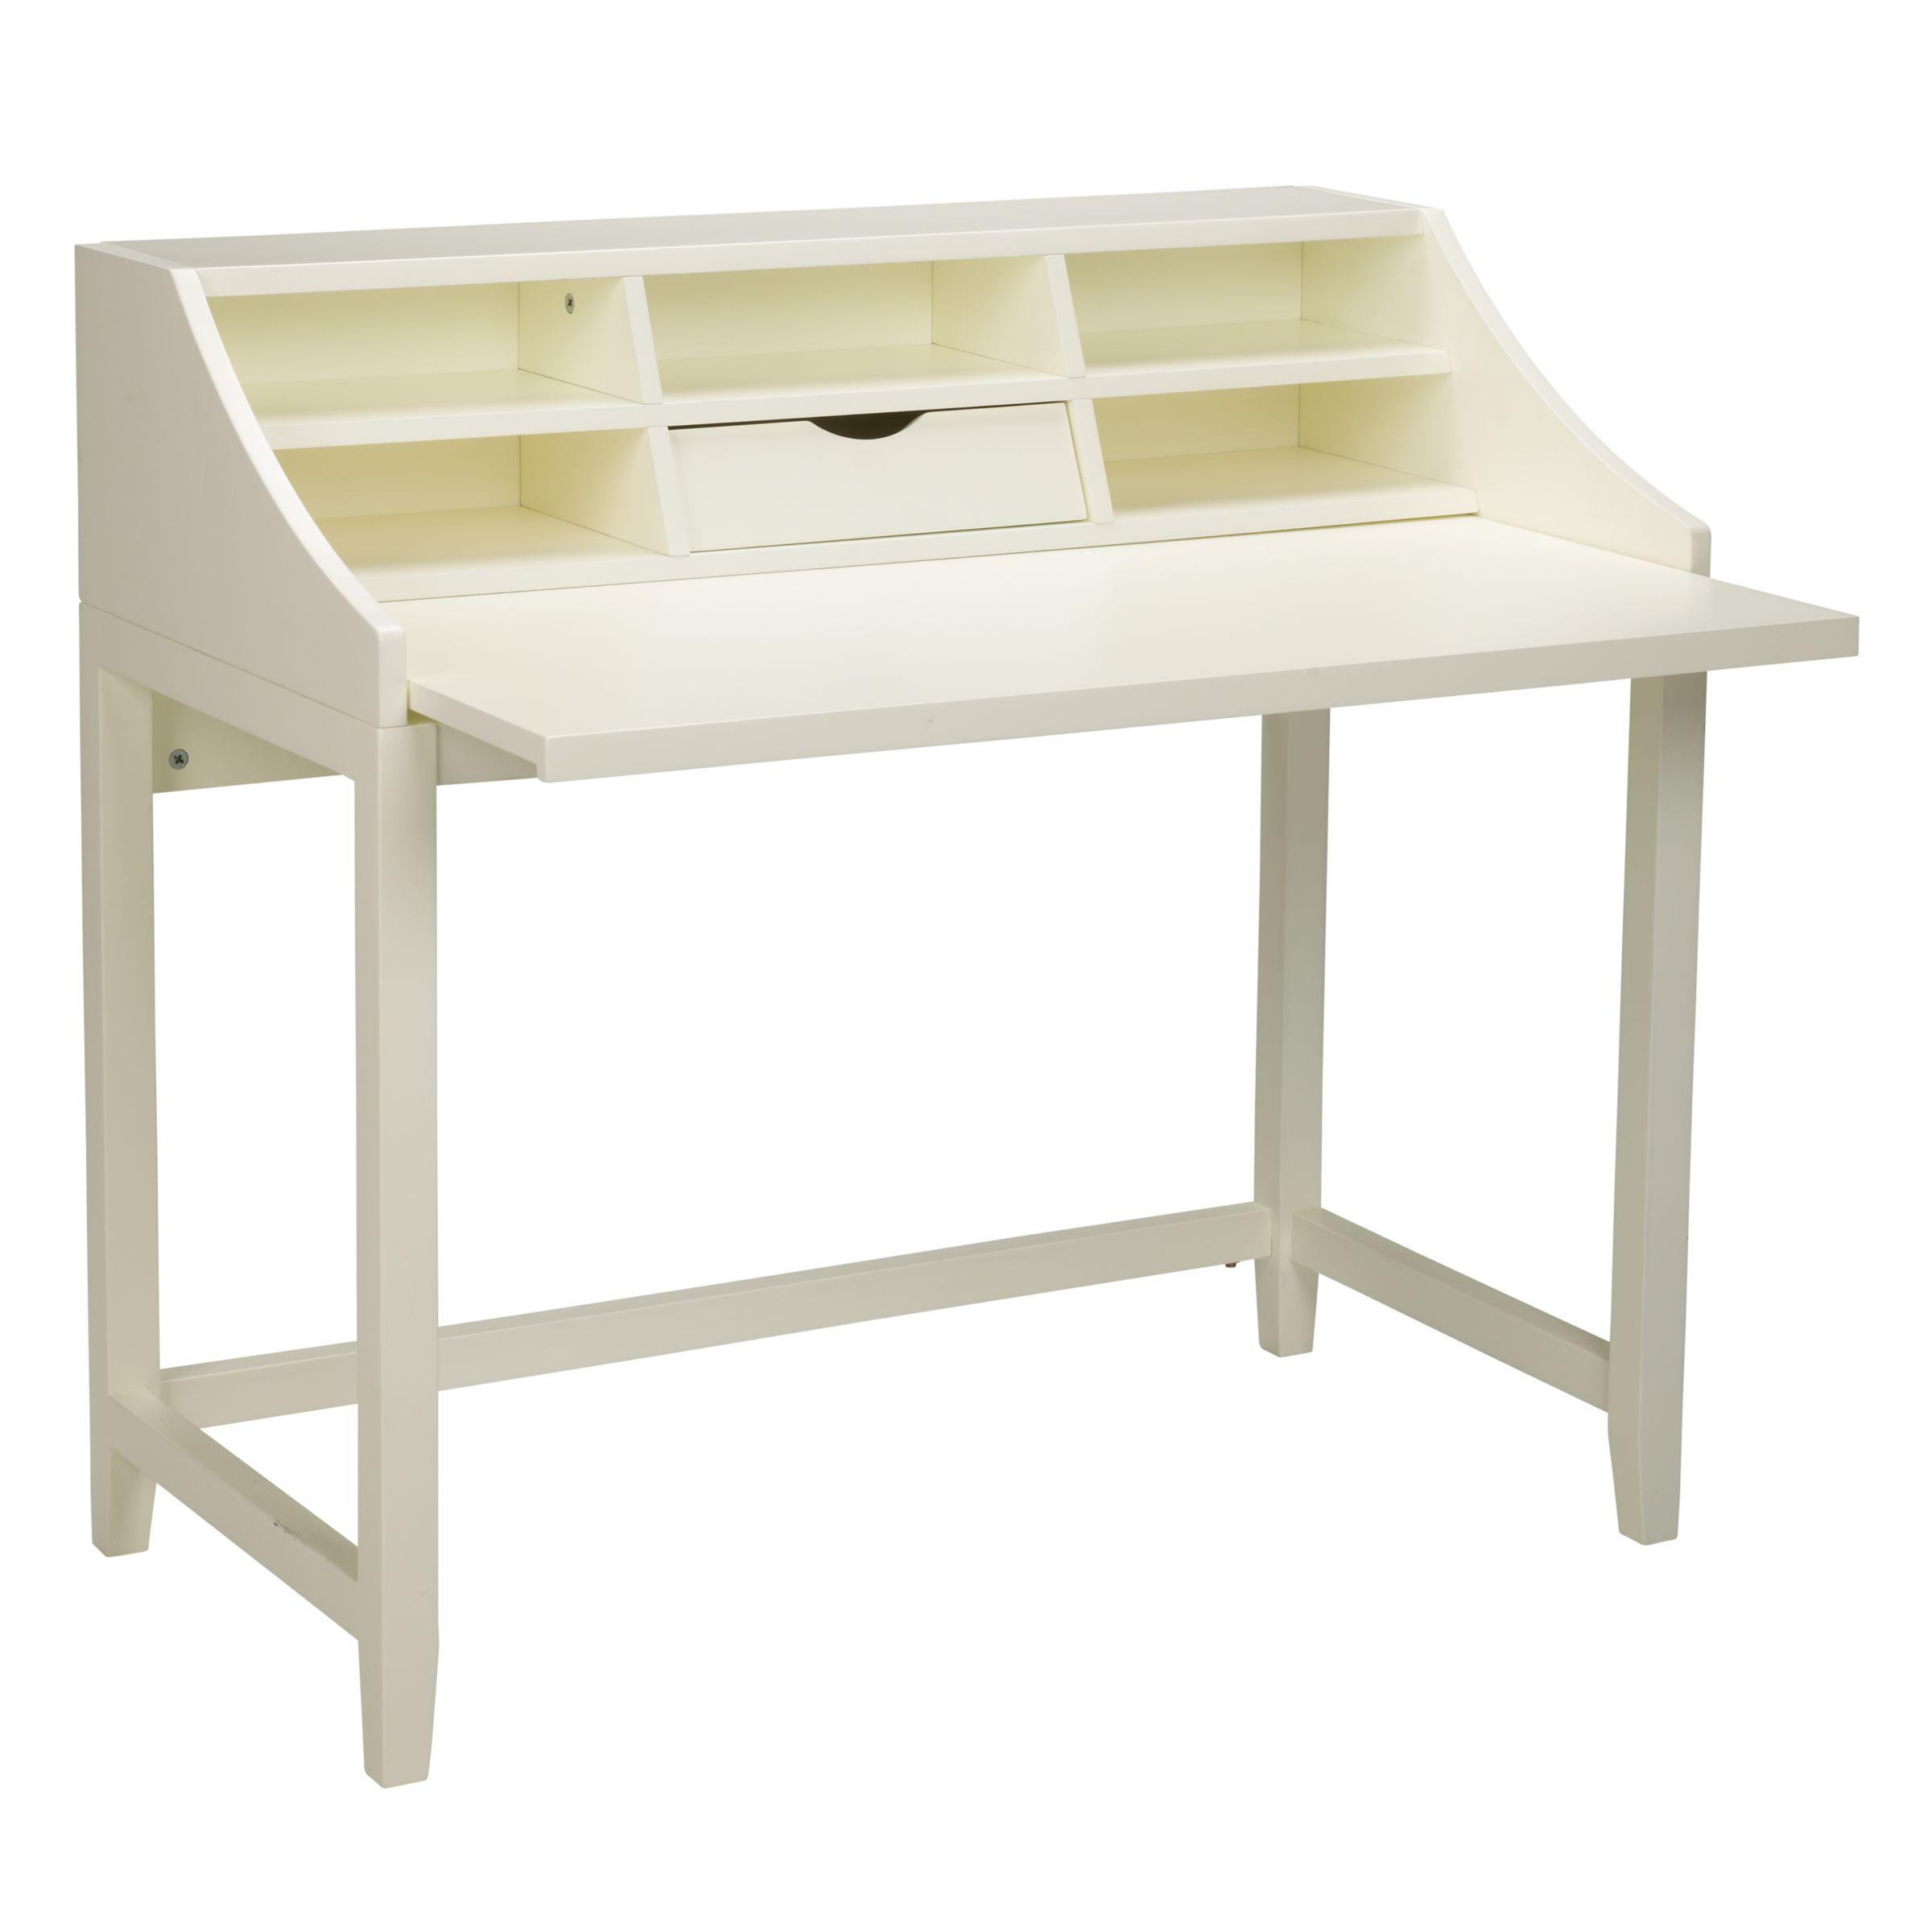 Amazing Buy Ebbe Gehl For John Lewis Mira Office Furniture Range Online At